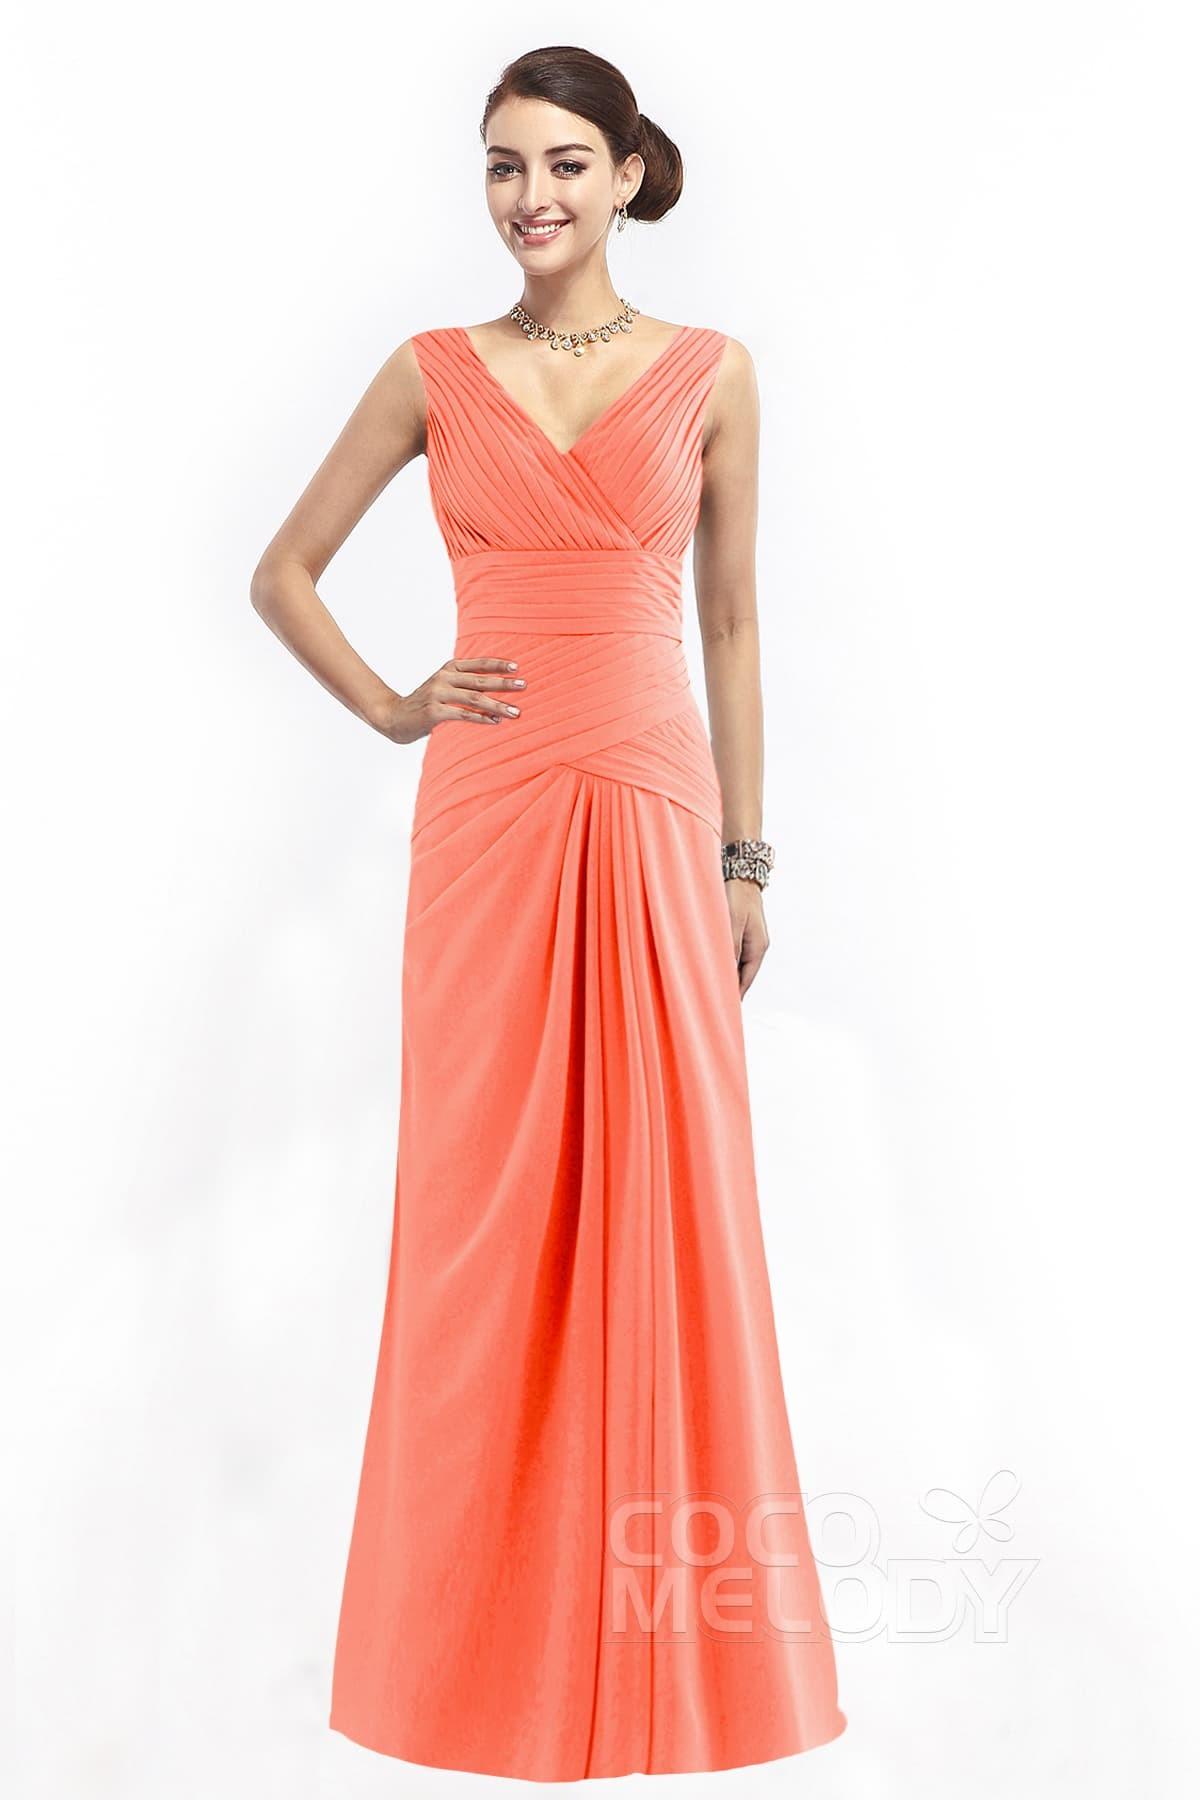 cb714d2e4bb3 Divine Sheath-Column V-Neck Natural Floor Length Chiffon Sleeveless Zipper  Bridesmaid Dress with